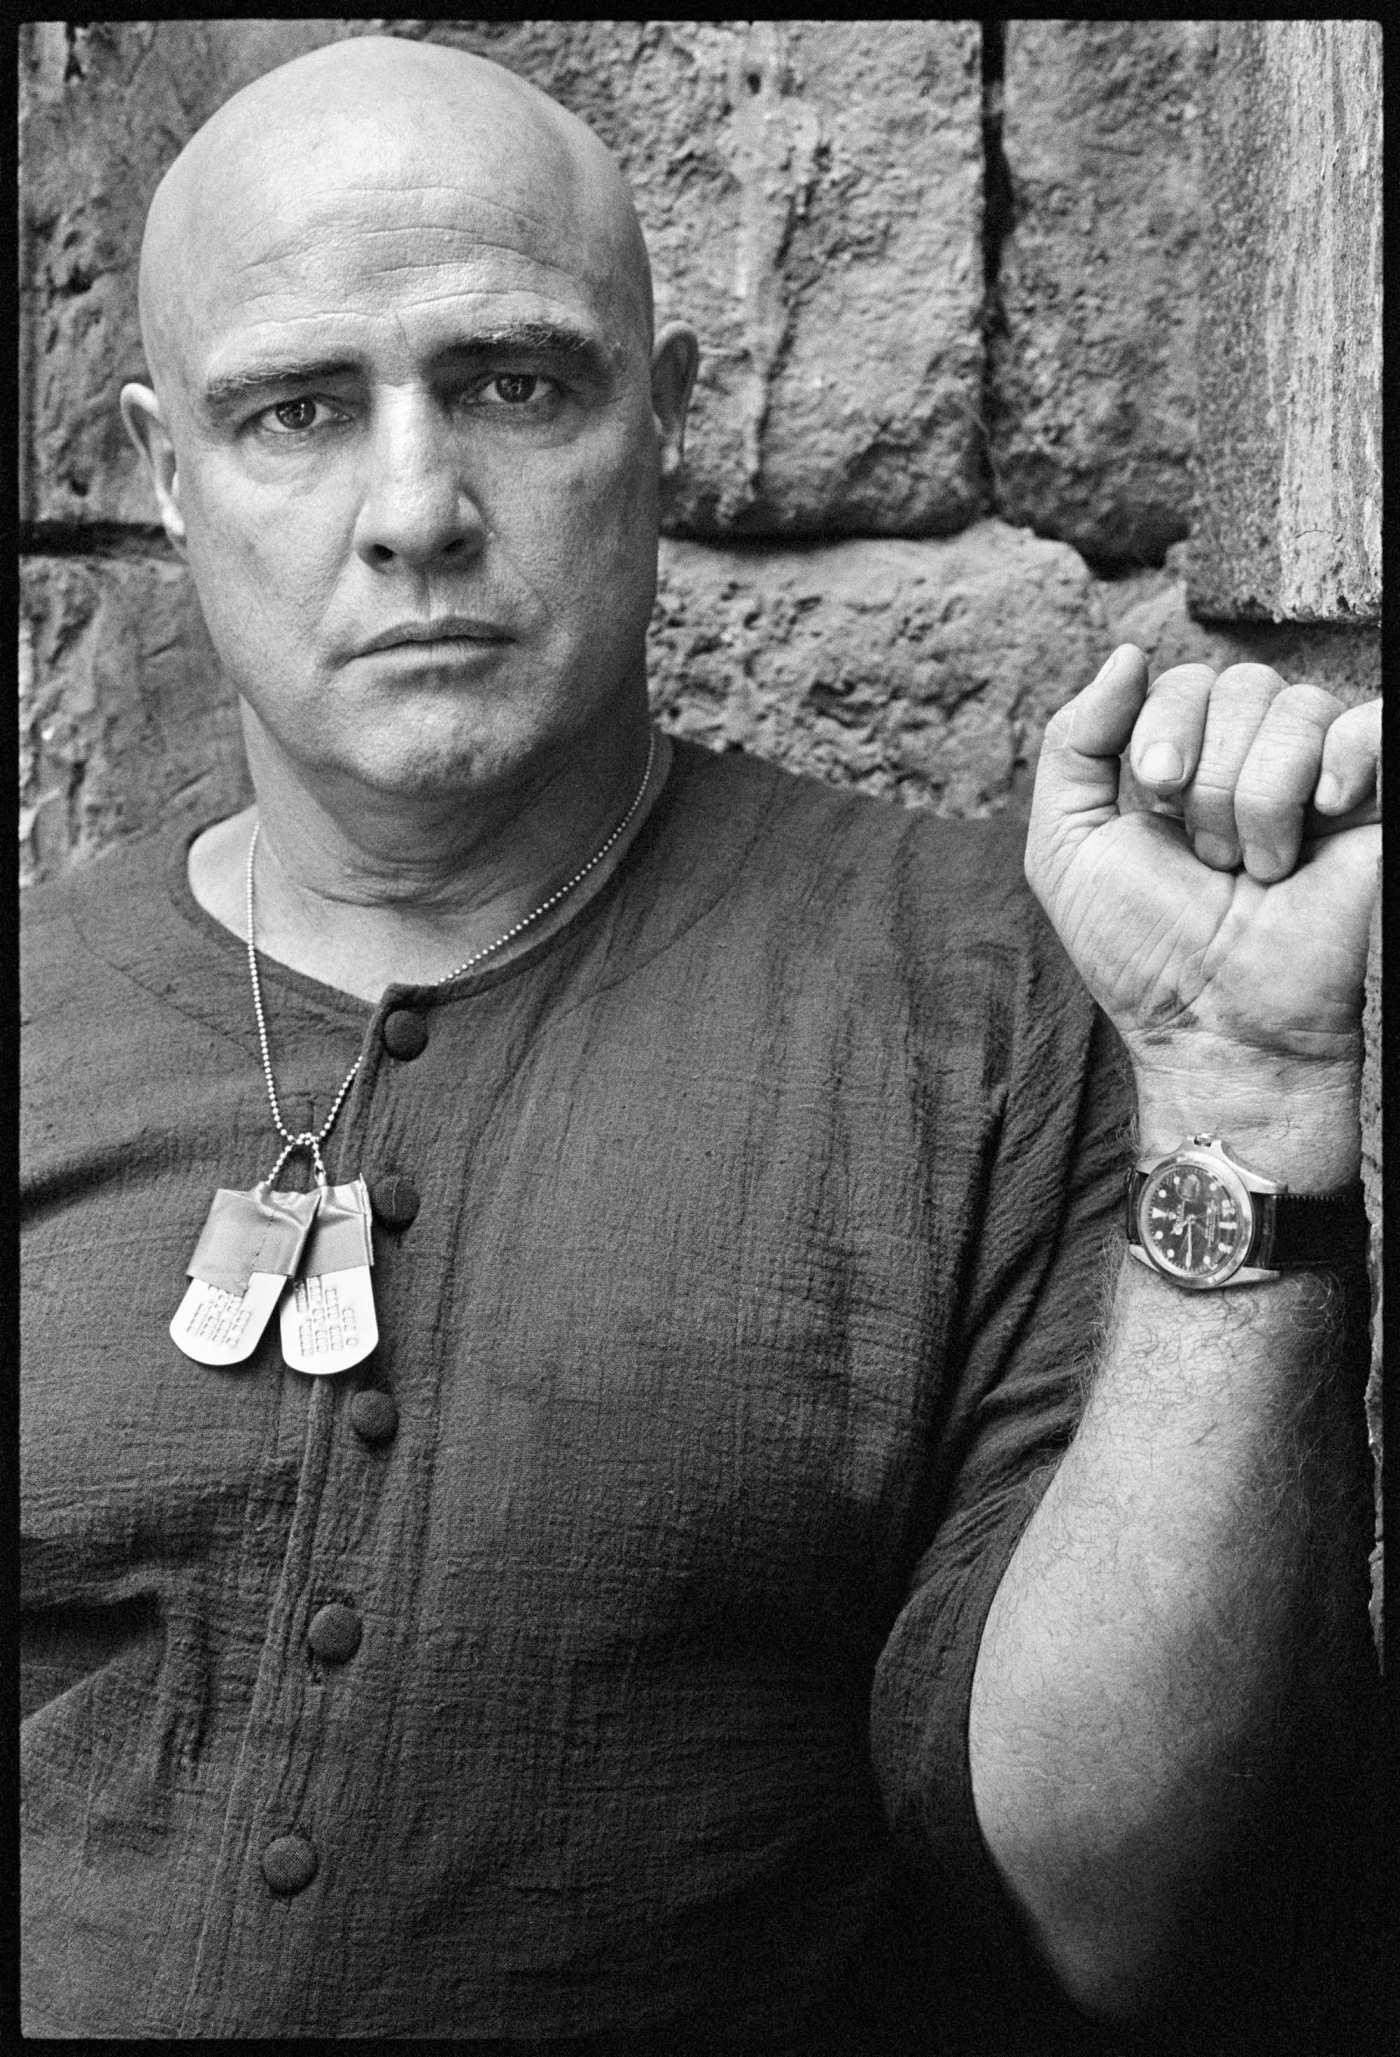 Marlon Brando on the Set of Apocalypse Now Rolex